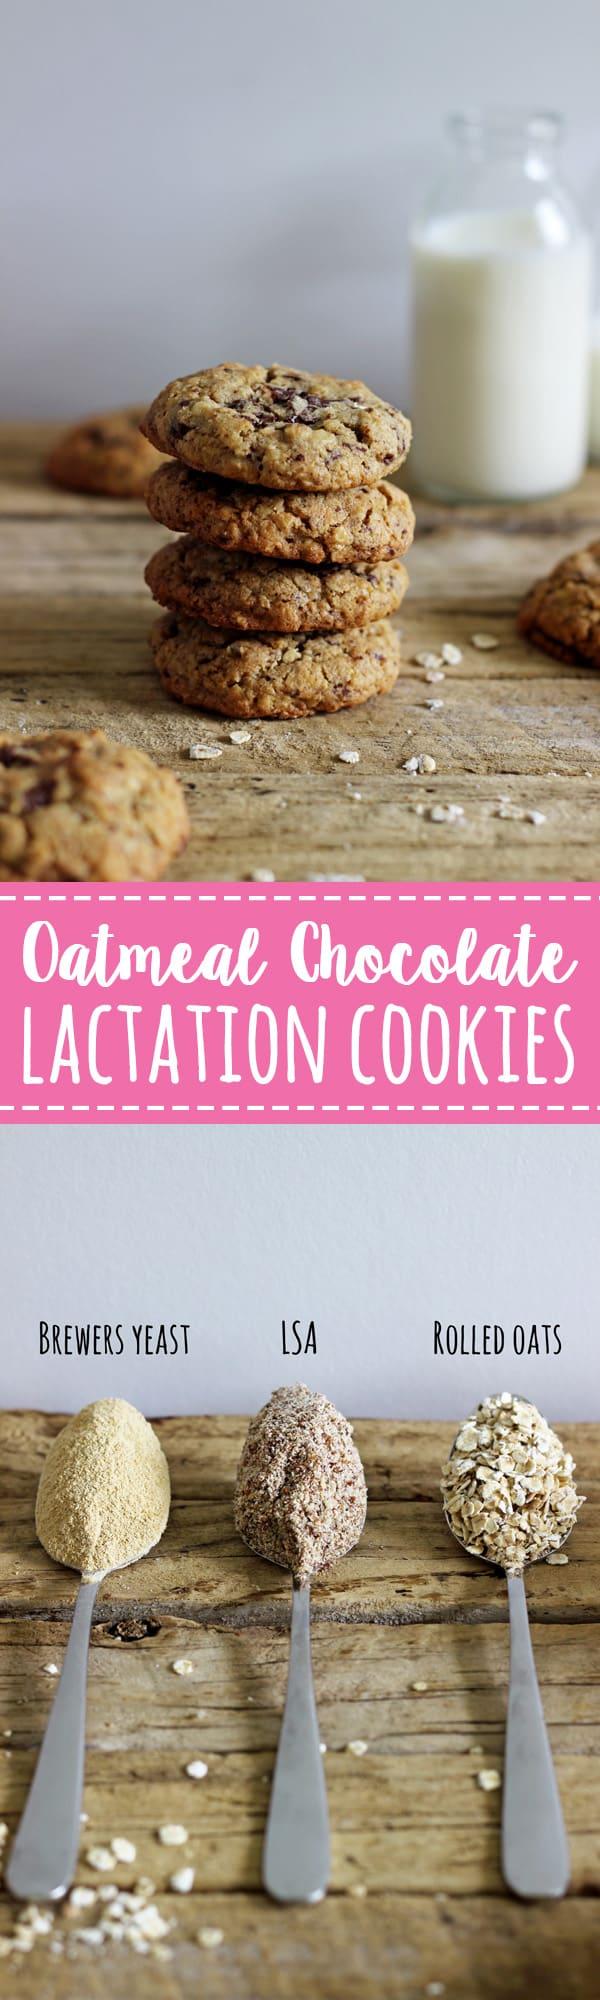 Oatmeal Chocolate Lactation Cookies